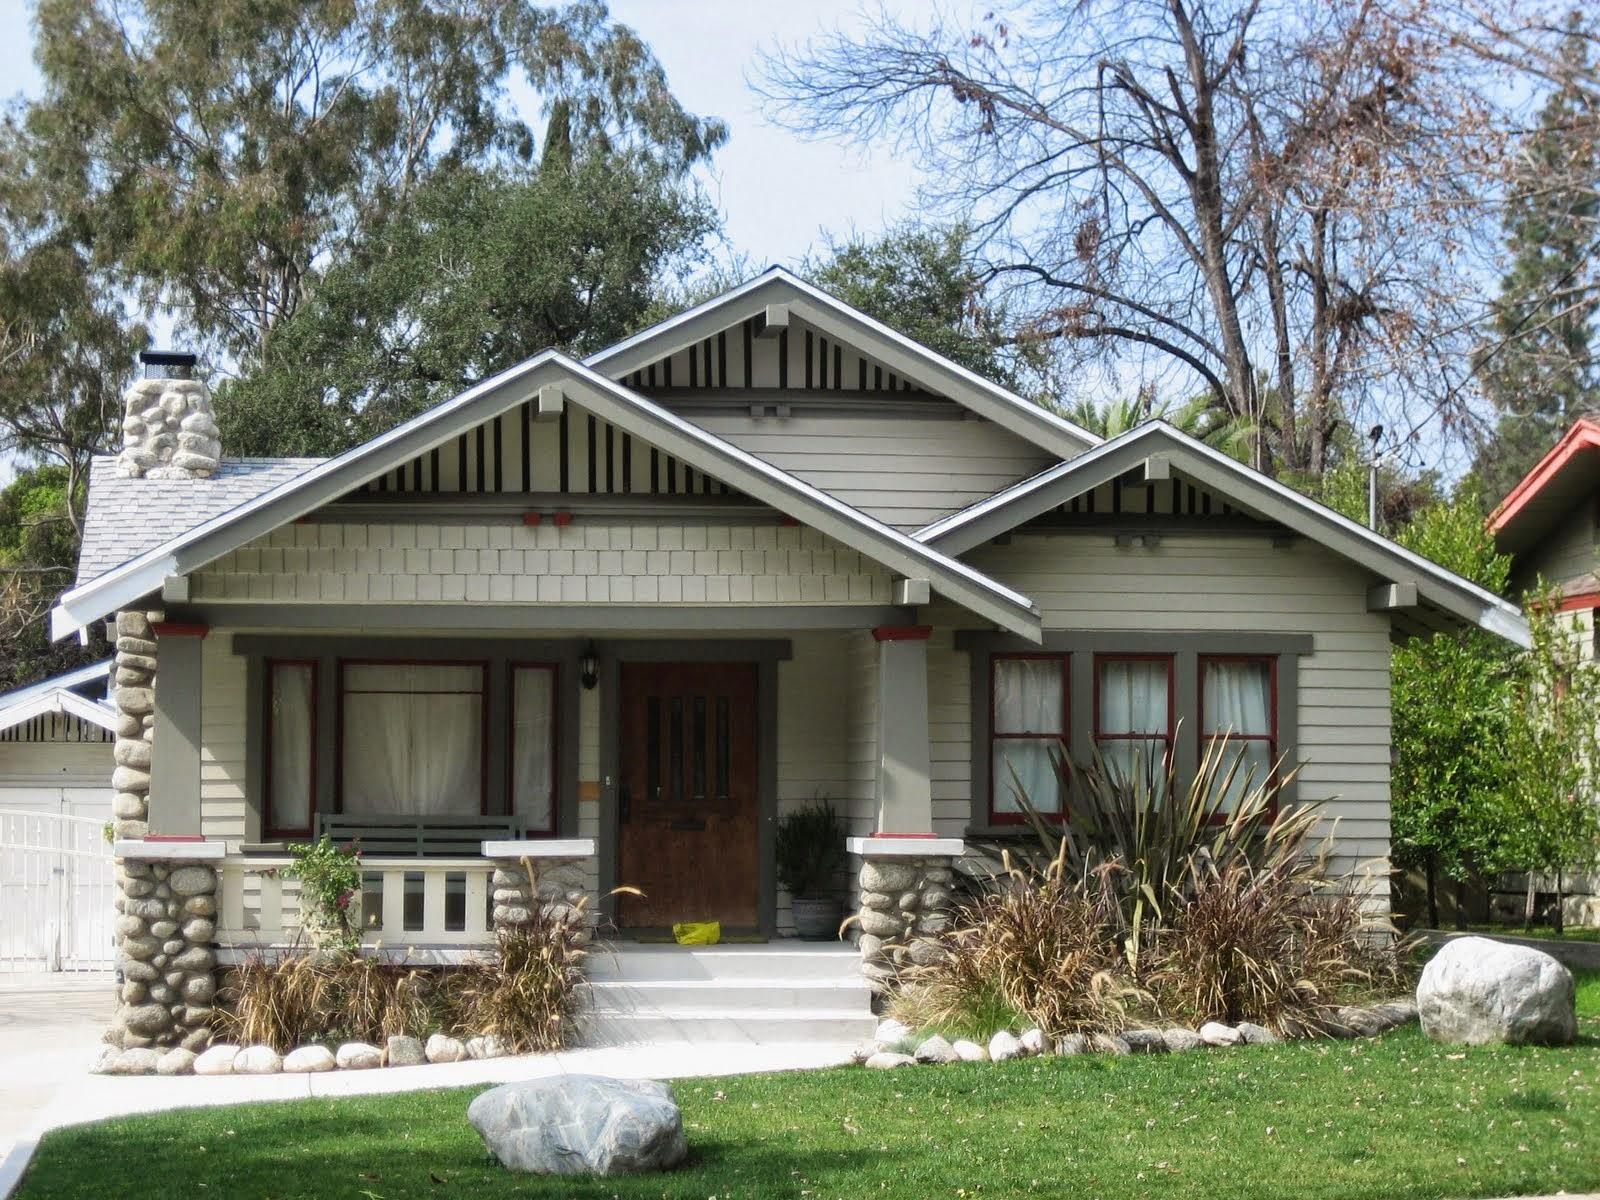 Exterior Home Ideas: #4 House Exterior Wall Design Ideas